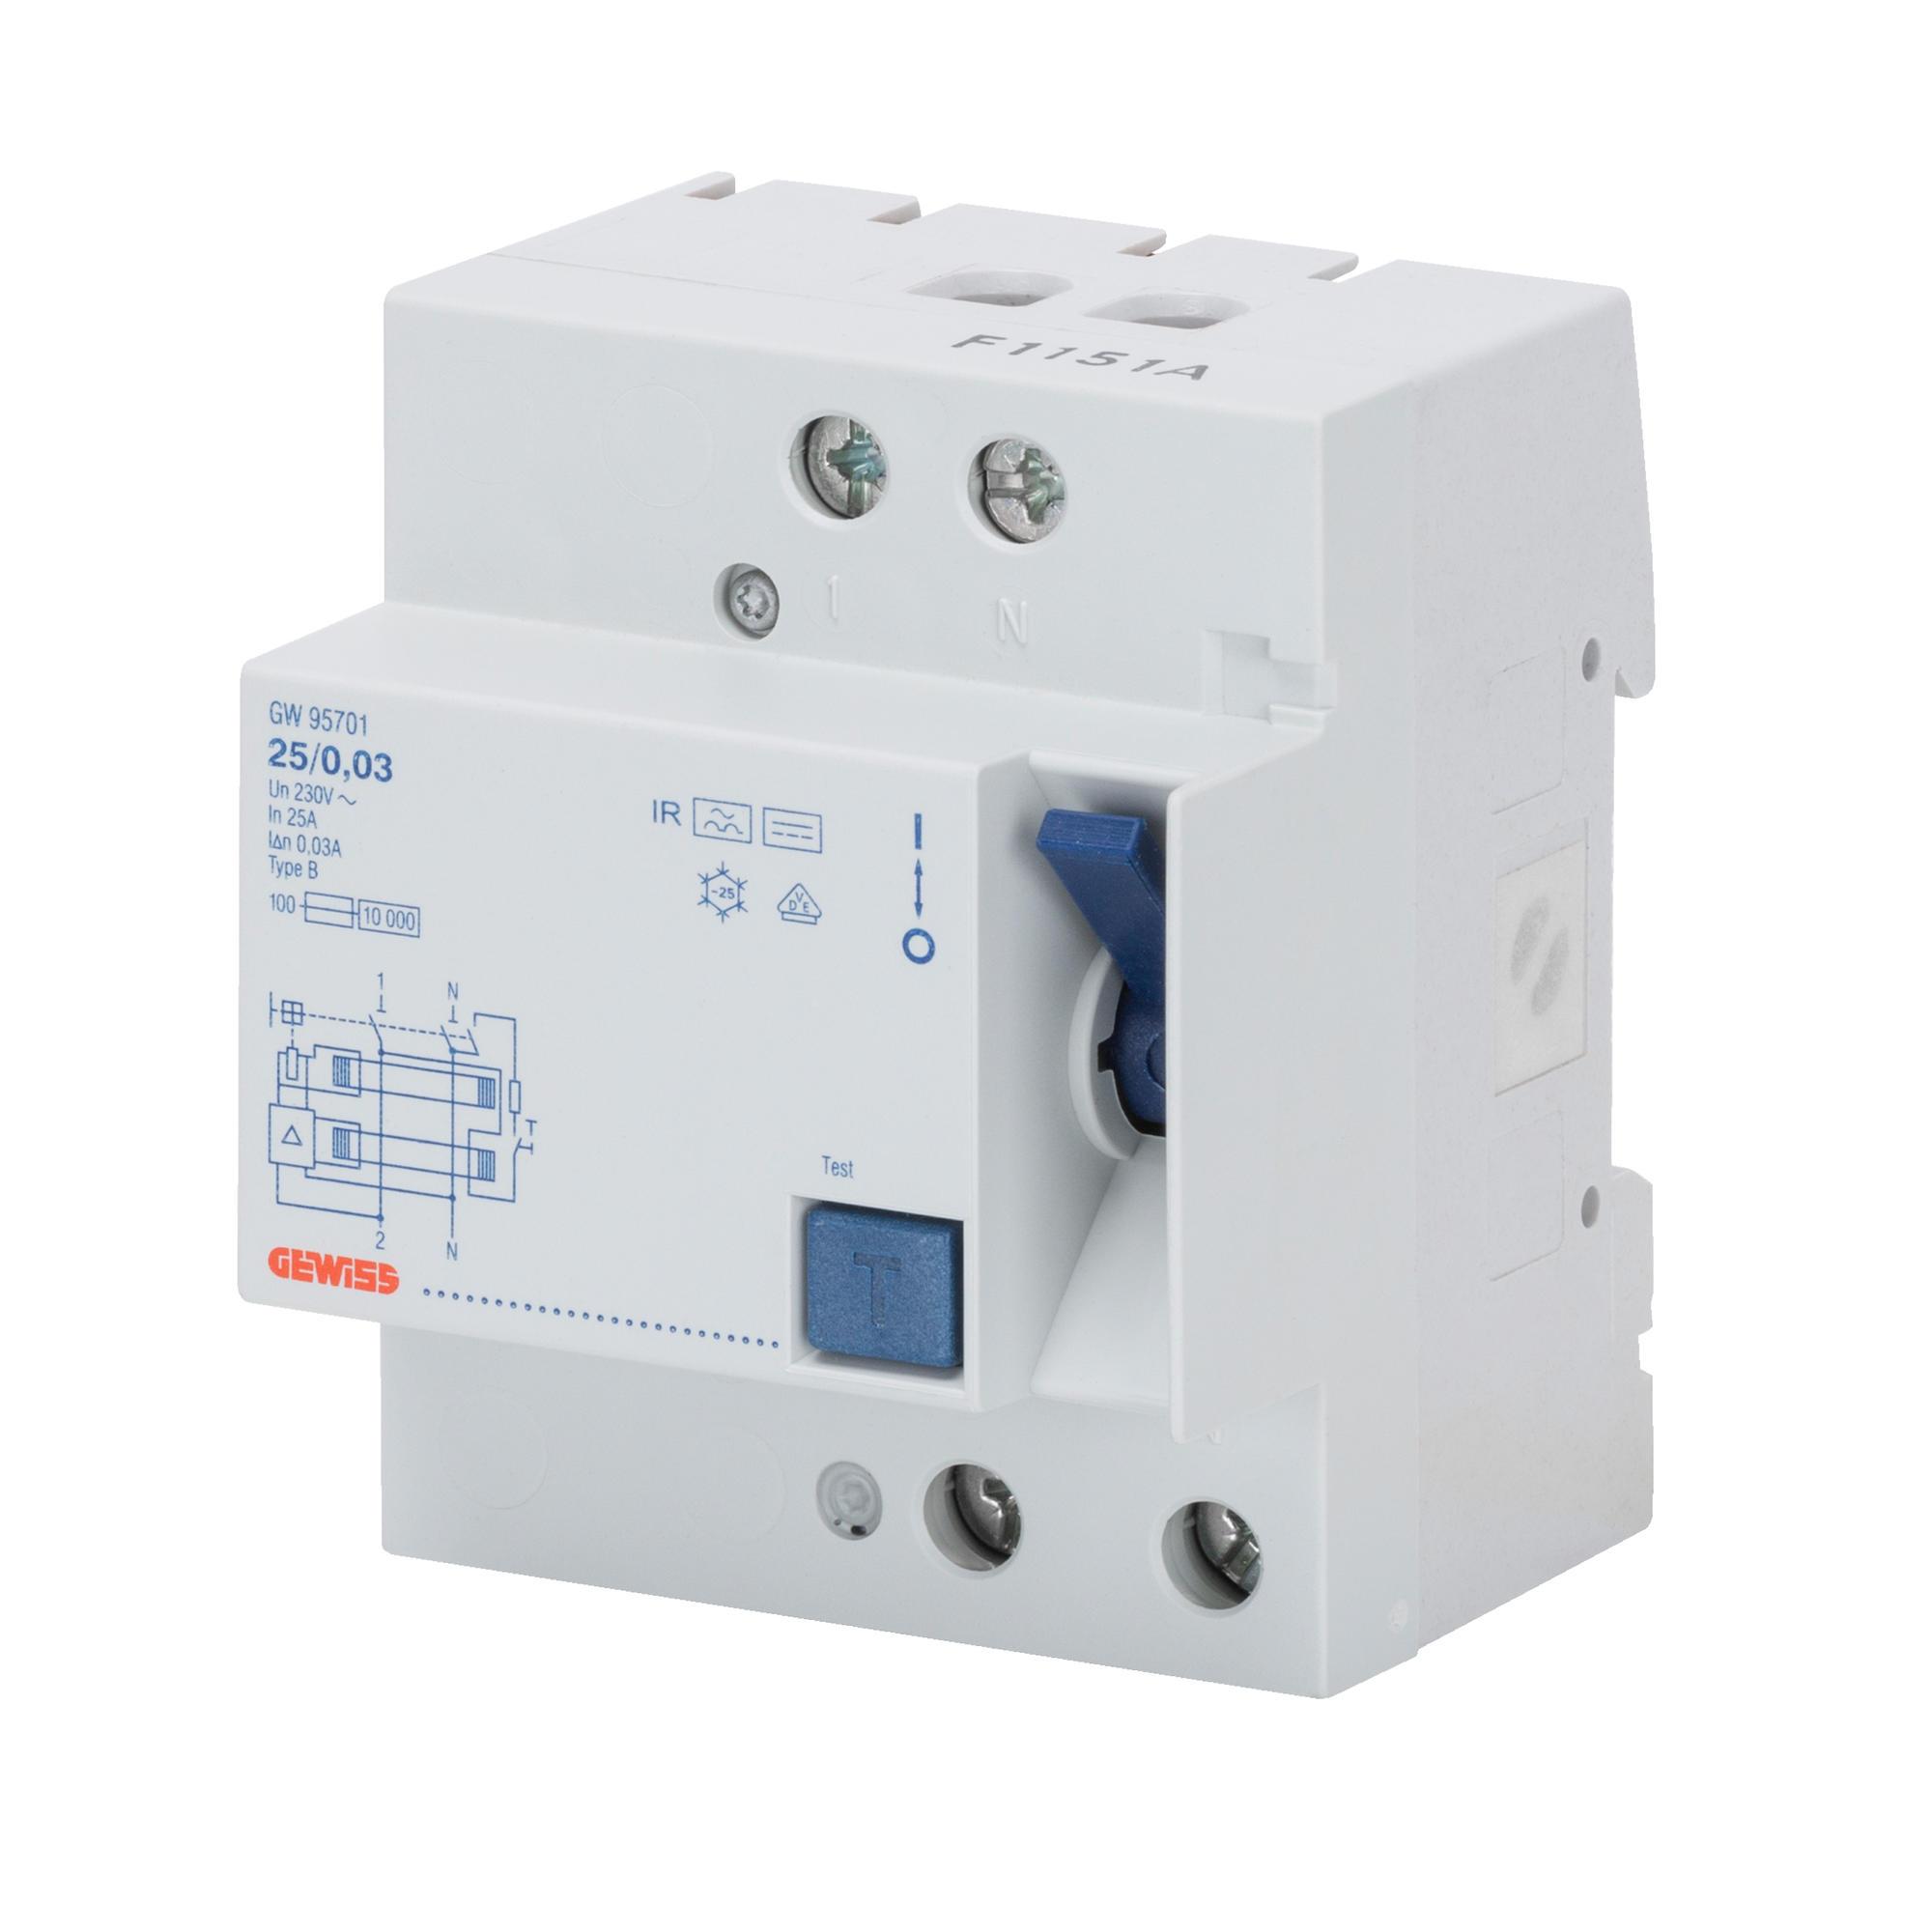 Rccb Gw95706 Gewiss Circuit Breaker A In Home Representative Image Download Photo